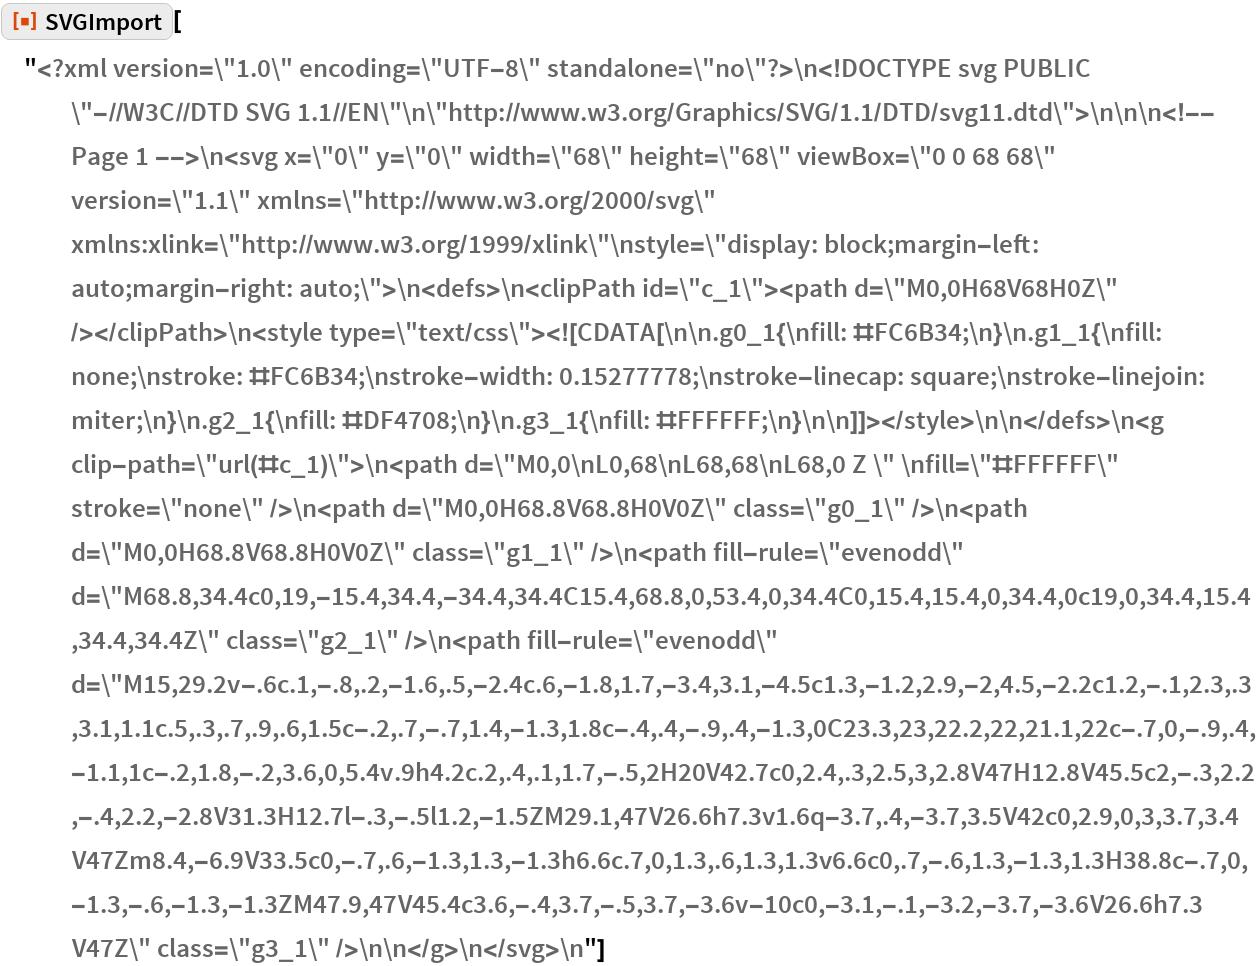 "ResourceFunction[  ""SVGImport""][""<?xml version=\""1.0\"" encoding=\""UTF-8\"" \ standalone=\""no\""?>\n<!DOCTYPE svg PUBLIC \""-//W3C//DTD SVG 1.1//EN\""\ \n\""http://www.w3.org/Graphics/SVG/1.1/DTD/svg11.dtd\"">\n\n\n<!-- \ Page 1 -->\n<svg x=\""0\"" y=\""0\"" width=\""68\"" height=\""68\"" \ viewBox=\""0 0 68 68\"" version=\""1.1\"" \ xmlns=\""http://www.w3.org/2000/svg\"" \ xmlns:xlink=\""http://www.w3.org/1999/xlink\""\nstyle=\""display: \ block;margin-left: auto;margin-right: auto;\"">\n<defs>\n<clipPath id=\ \""c_1\""><path d=\""M0,0H68V68H0Z\"" /></clipPath>\n<style \ type=\""text/css\""><![CDATA[\n\n.g0_1{\nfill: #FC6B34;\n}\n.g1_1{\n\ fill: none;\nstroke: #FC6B34;\nstroke-width: 0.15277778;\n\ stroke-linecap: square;\nstroke-linejoin: miter;\n}\n.g2_1{\nfill: \ #DF4708;\n}\n.g3_1{\nfill: #FFFFFF;\n}\n\n]]></style>\n\n</defs>\n<g \ clip-path=\""url(#c_1)\"">\n<path d=\""M0,0\nL0,68\nL68,68\nL68,0 Z \"" \n\ fill=\""#FFFFFF\"" stroke=\""none\"" />\n<path d=\""M0,0H68.8V68.8H0V0Z\"" \ class=\""g0_1\"" />\n<path d=\""M0,0H68.8V68.8H0V0Z\"" class=\""g1_1\"" />\n\ <path fill-rule=\""evenodd\"" \ d=\""M68.8,34.4c0,19,-15.4,34.4,-34.4,34.4C15.4,68.8,0,53.4,0,34.4C0,\ 15.4,15.4,0,34.4,0c19,0,34.4,15.4,34.4,34.4Z\"" class=\""g2_1\"" />\n\ <path fill-rule=\""evenodd\"" \ d=\""M15,29.2v-.6c.1,-.8,.2,-1.6,.5,-2.4c.6,-1.8,1.7,-3.4,3.1,-4.5c1.3,\ -1.2,2.9,-2,4.5,-2.2c1.2,-.1,2.3,.3,3.1,1.1c.5,.3,.7,.9,.6,1.5c-.2,.7,\ -.7,1.4,-1.3,1.8c-.4,.4,-.9,.4,-1.3,0C23.3,23,22.2,22,21.1,22c-.7,0,-.\ 9,.4,-1.1,1c-.2,1.8,-.2,3.6,0,5.4v.9h4.2c.2,.4,.1,1.7,-.5,2H20V42.7c0,\ 2.4,.3,2.5,3,2.8V47H12.8V45.5c2,-.3,2.2,-.4,2.2,-2.8V31.3H12.7l-.3,-.\ 5l1.2,-1.5ZM29.1,47V26.6h7.3v1.6q-3.7,.4,-3.7,3.5V42c0,2.9,0,3,3.7,3.\ 4V47Zm8.4,-6.9V33.5c0,-.7,.6,-1.3,1.3,-1.3h6.6c.7,0,1.3,.6,1.3,1.3v6.\ 6c0,.7,-.6,1.3,-1.3,1.3H38.8c-.7,0,-1.3,-.6,-1.3,-1.3ZM47.9,47V45.4c3.\ 6,-.4,3.7,-.5,3.7,-3.6v-10c0,-3.1,-.1,-3.2,-3.7,-3.6V26.6h7.3V47Z\"" \ class=\""g3_1\"" />\n\n</g>\n</svg>\n""]"